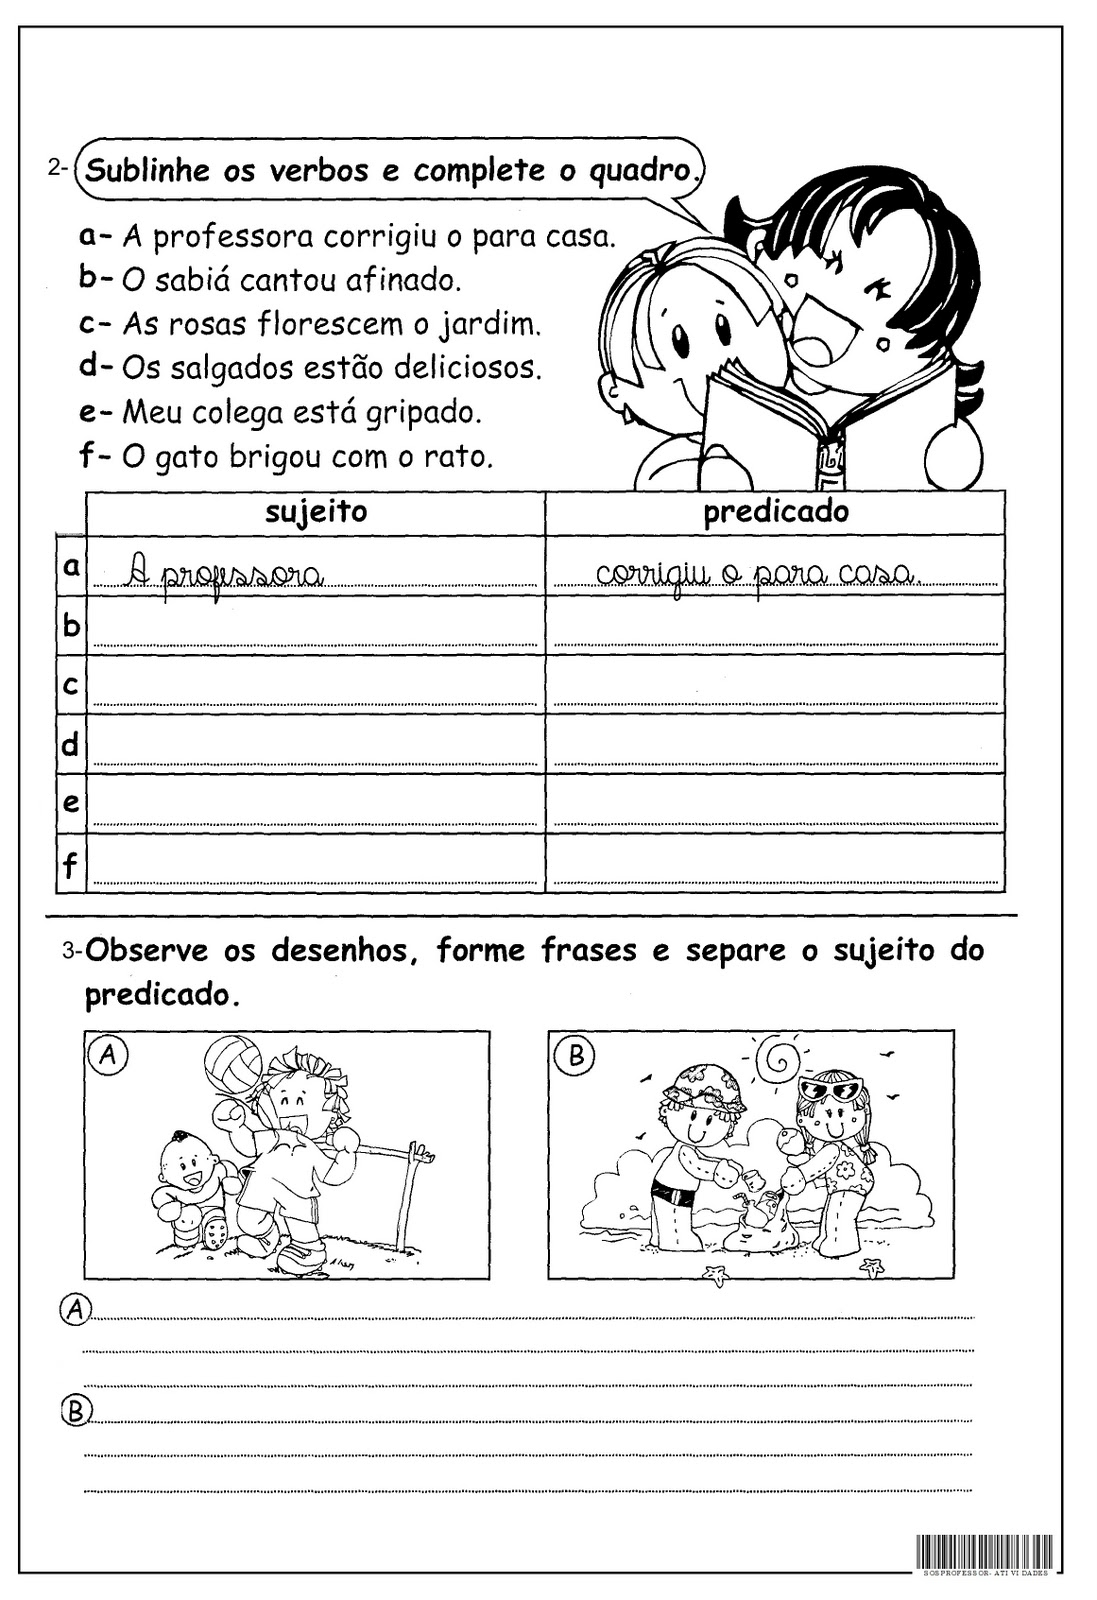 Sujeito Predicado Atividades Ling Portuguesa Imprimir   8